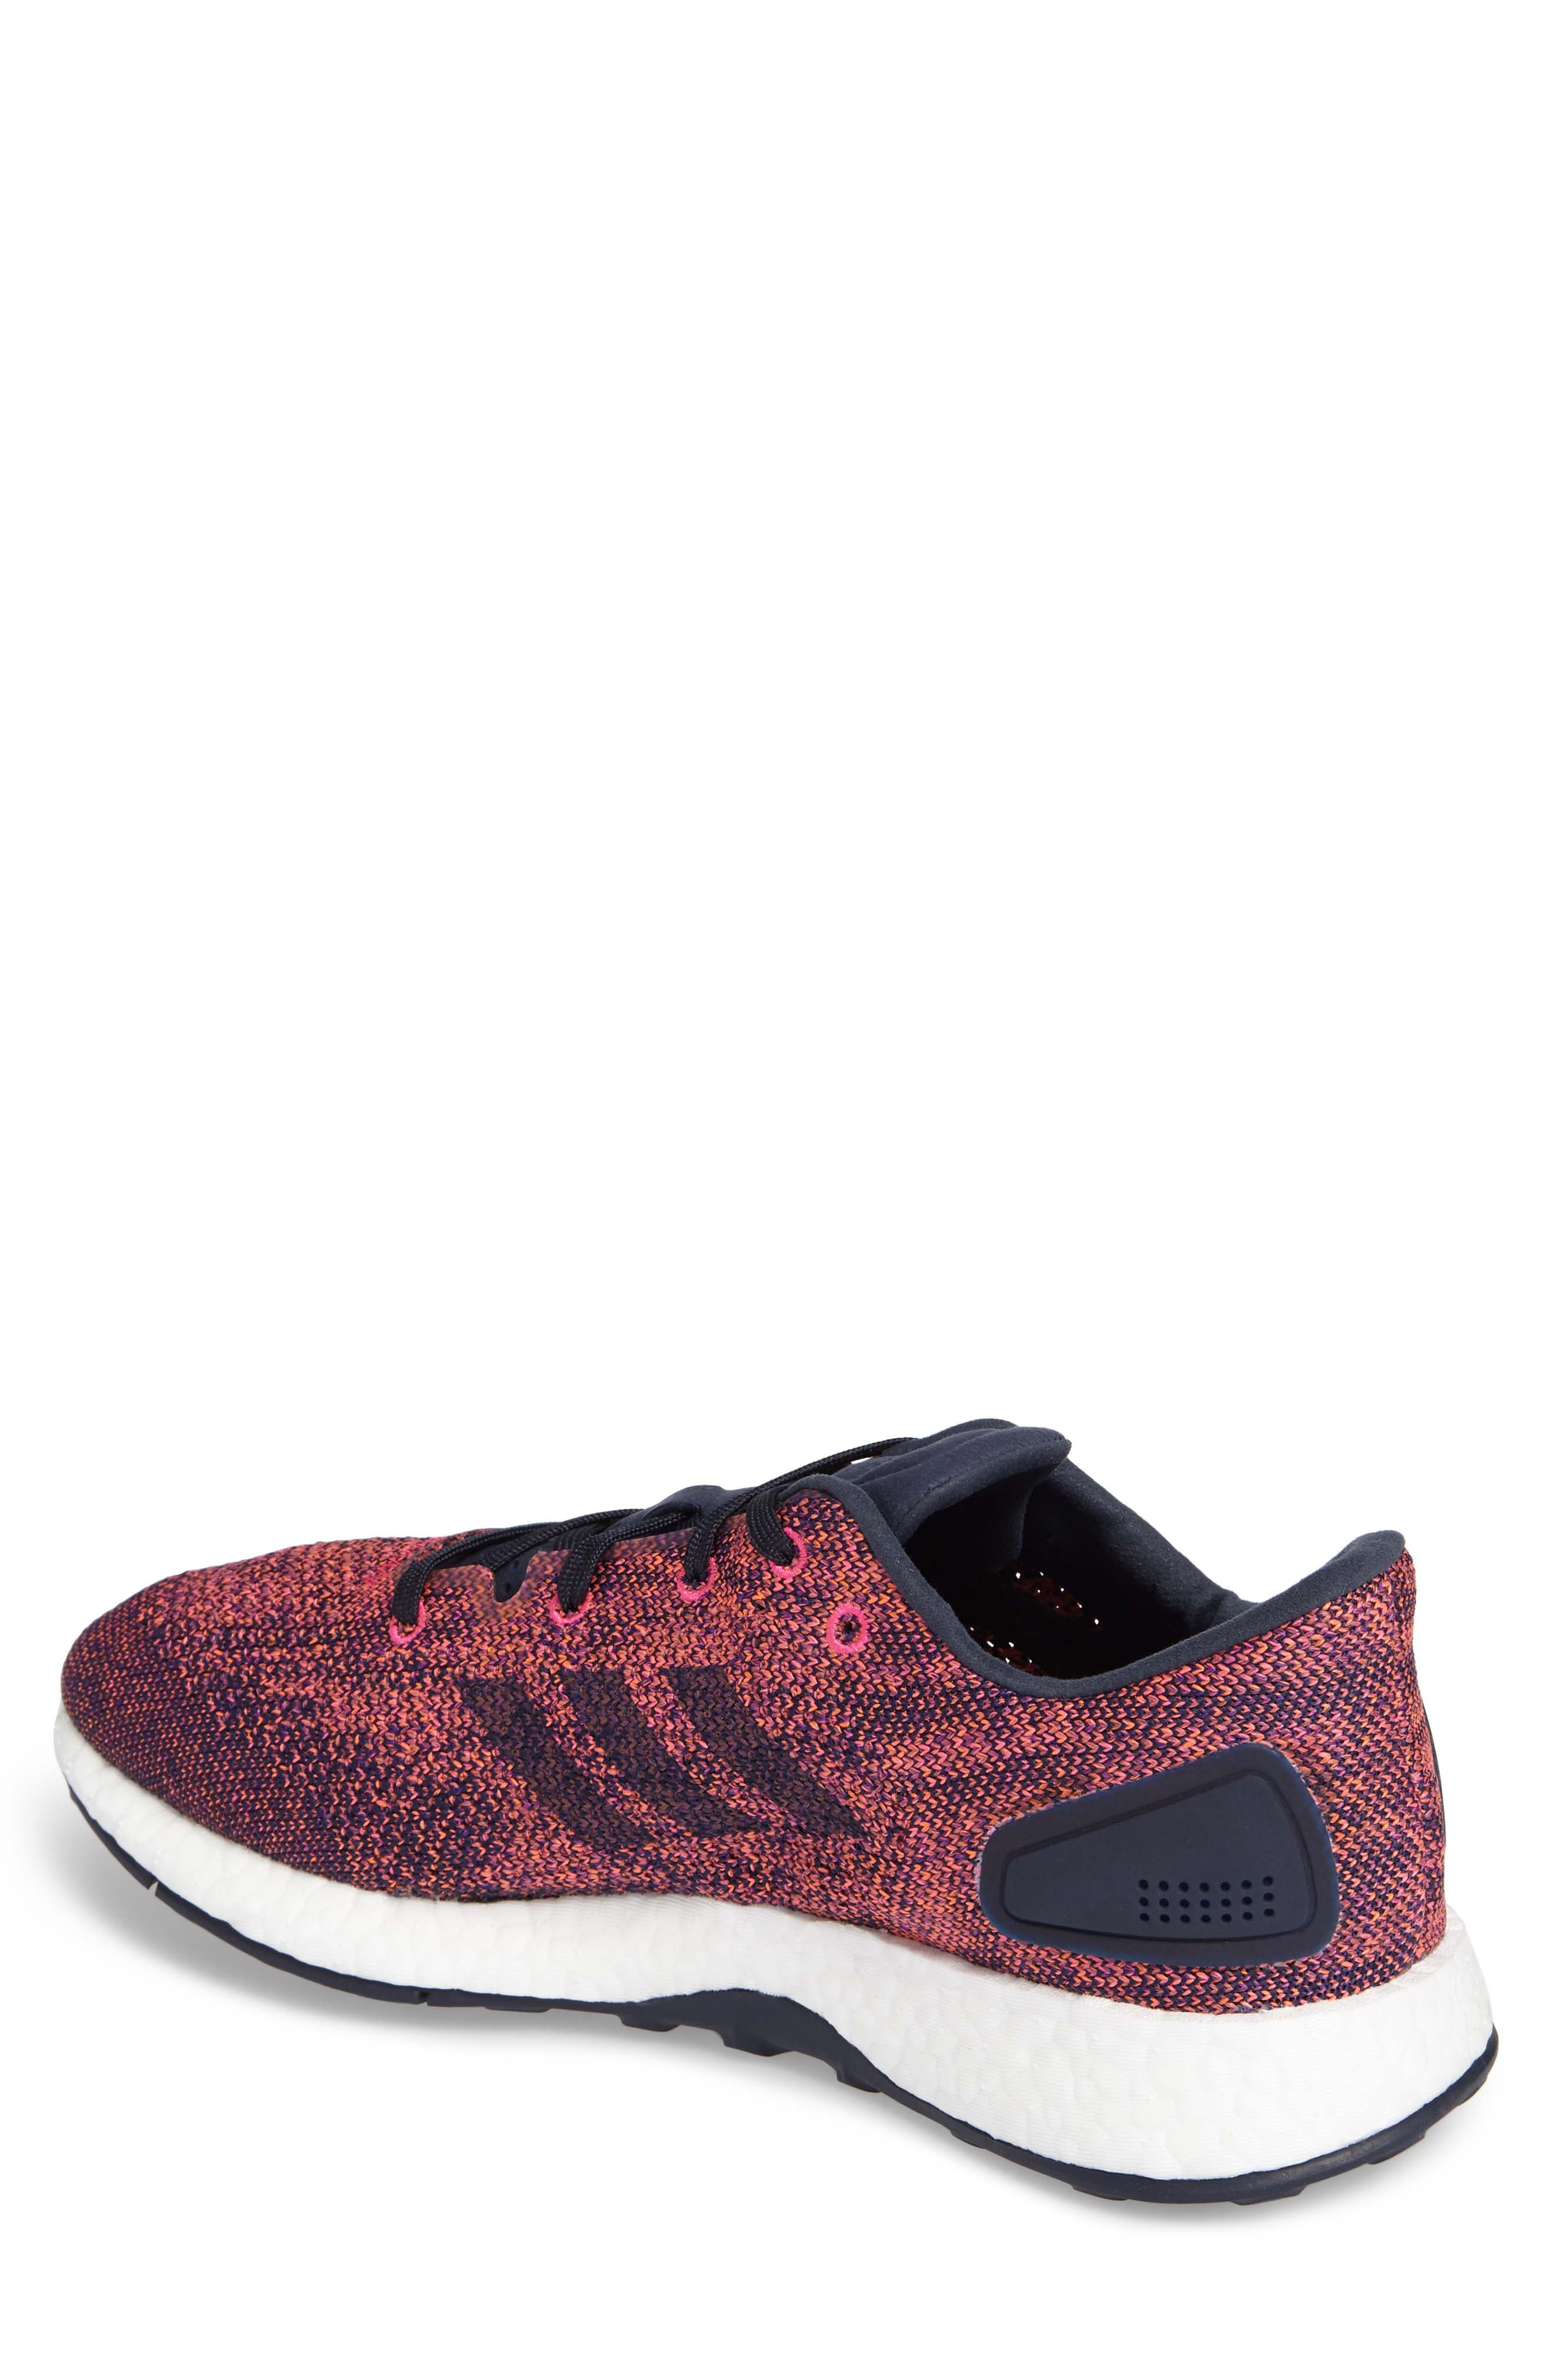 PureBoost DPR LTD Running Shoe,                             Alternate thumbnail 2, color,